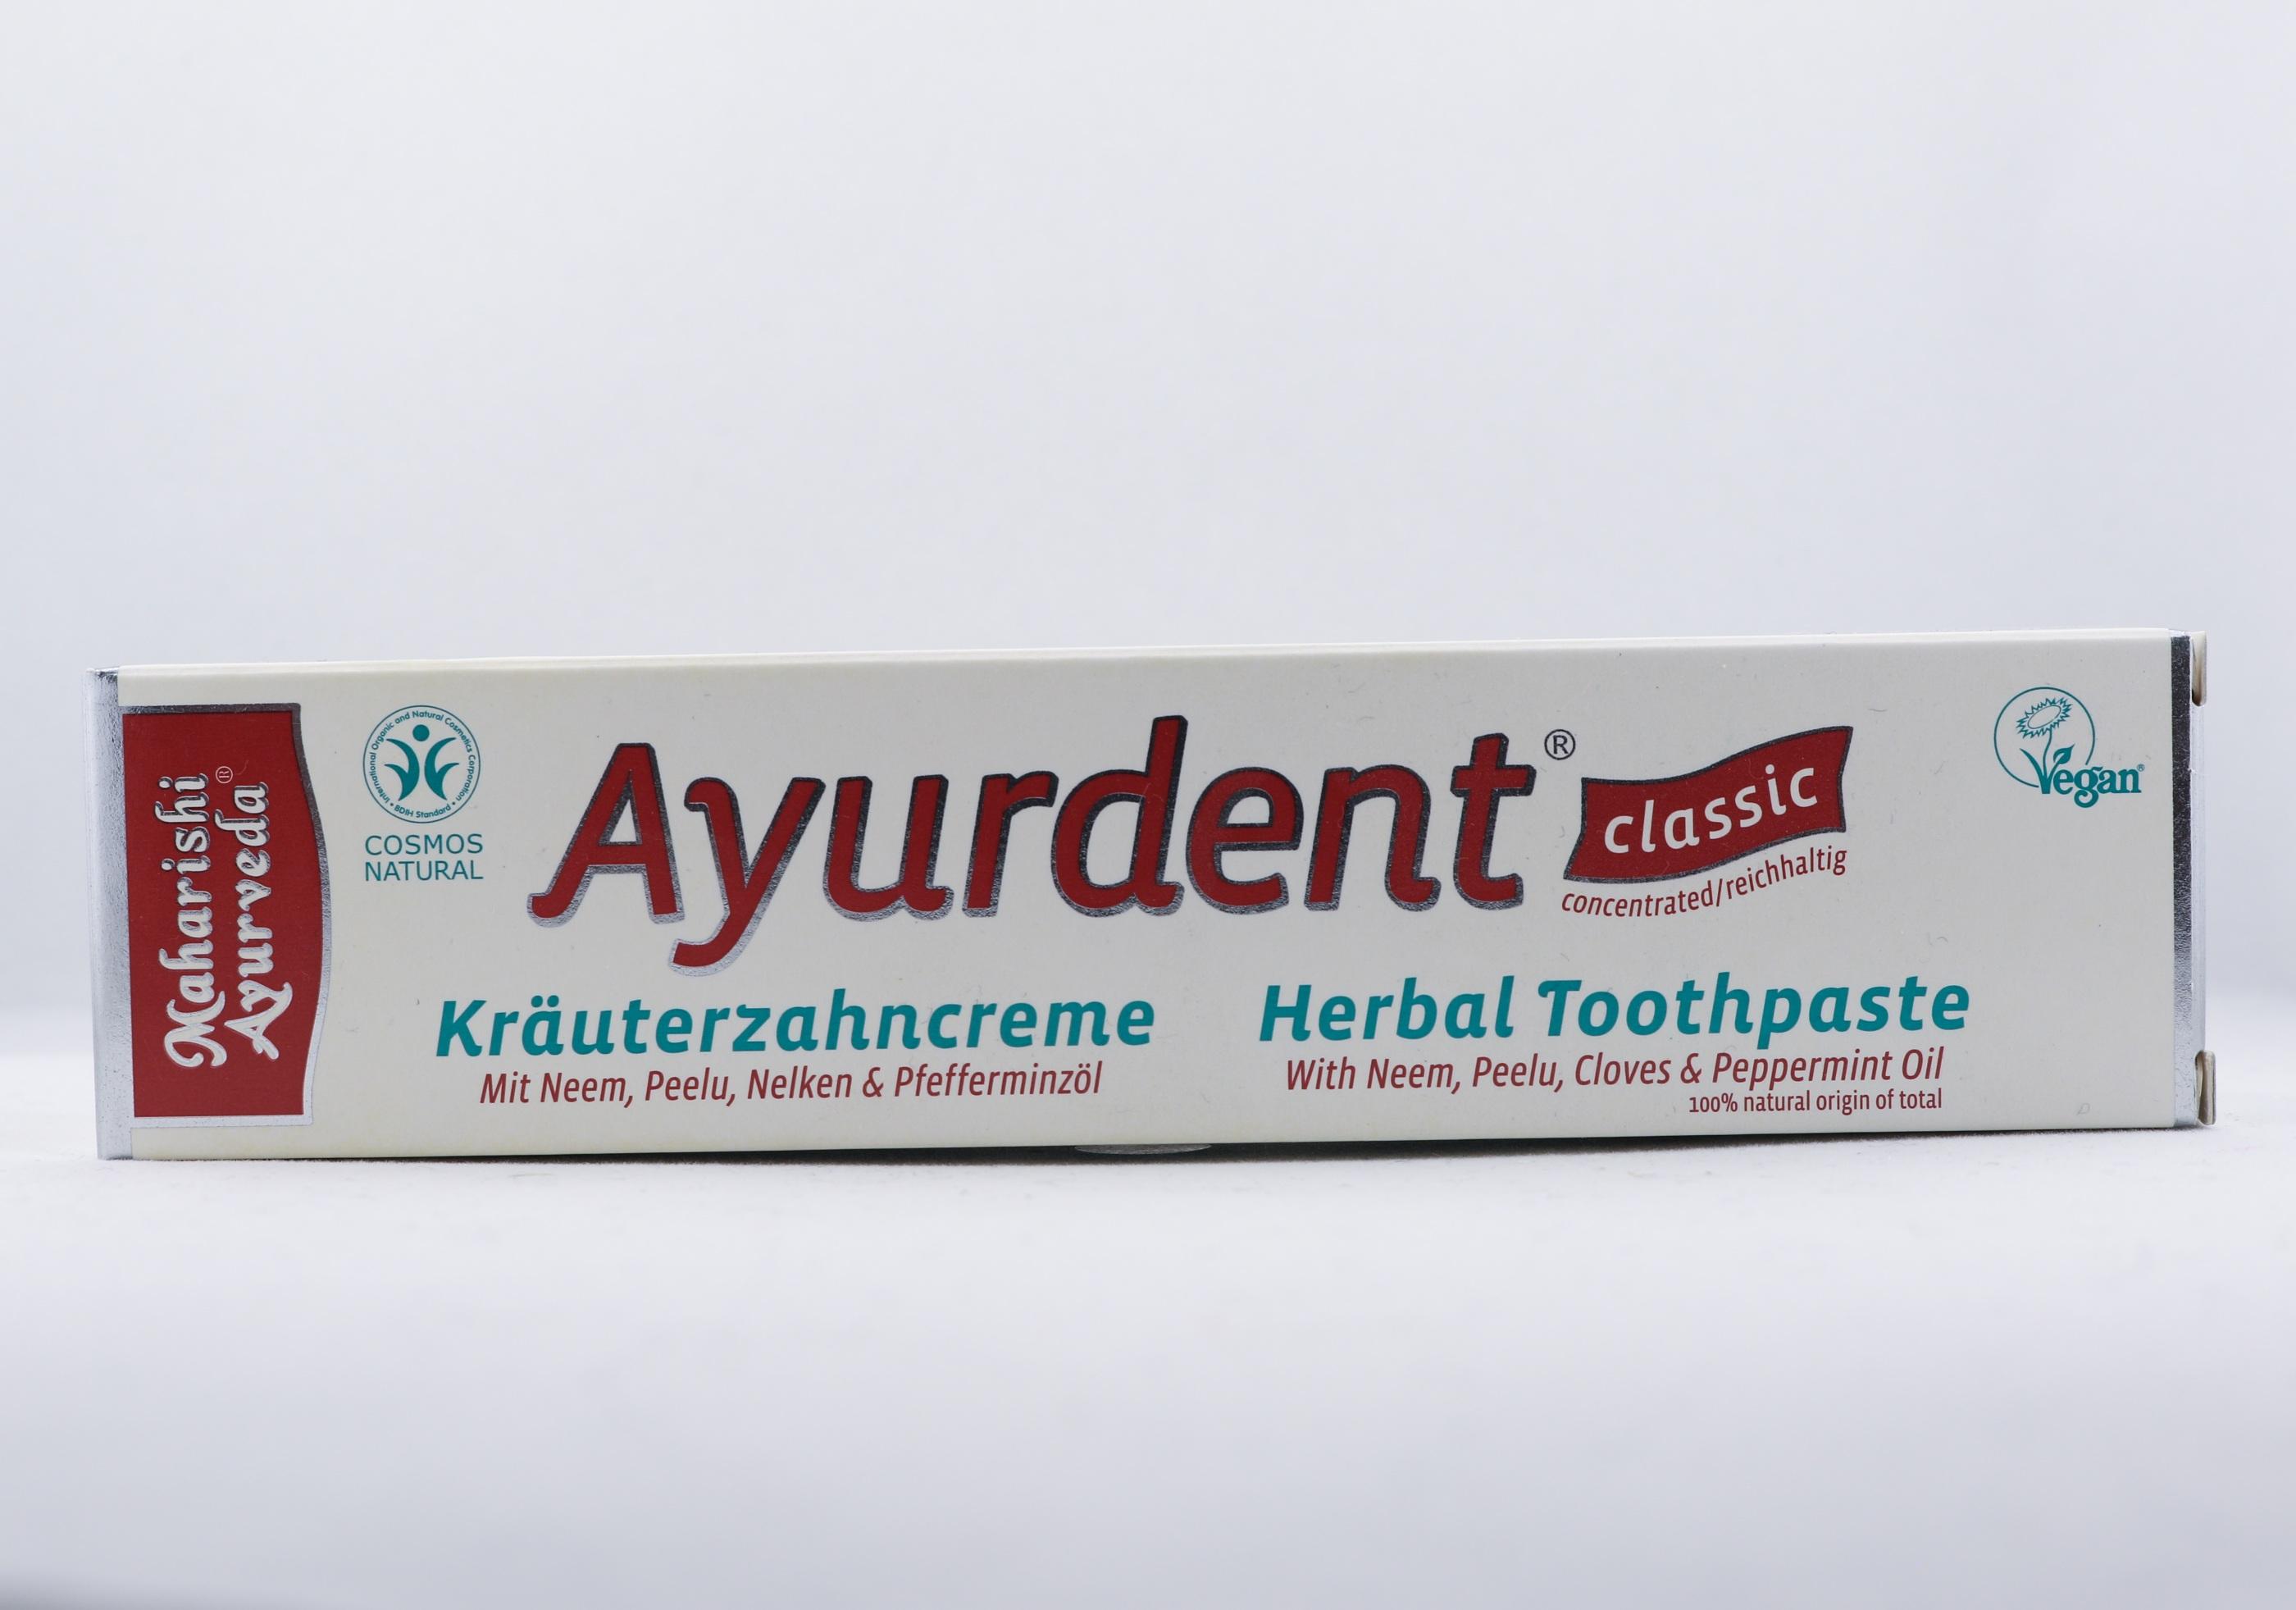 Ayurdent Örttandkräm - Klassisk wellness ayurveda halmstad sweden svensk hygien